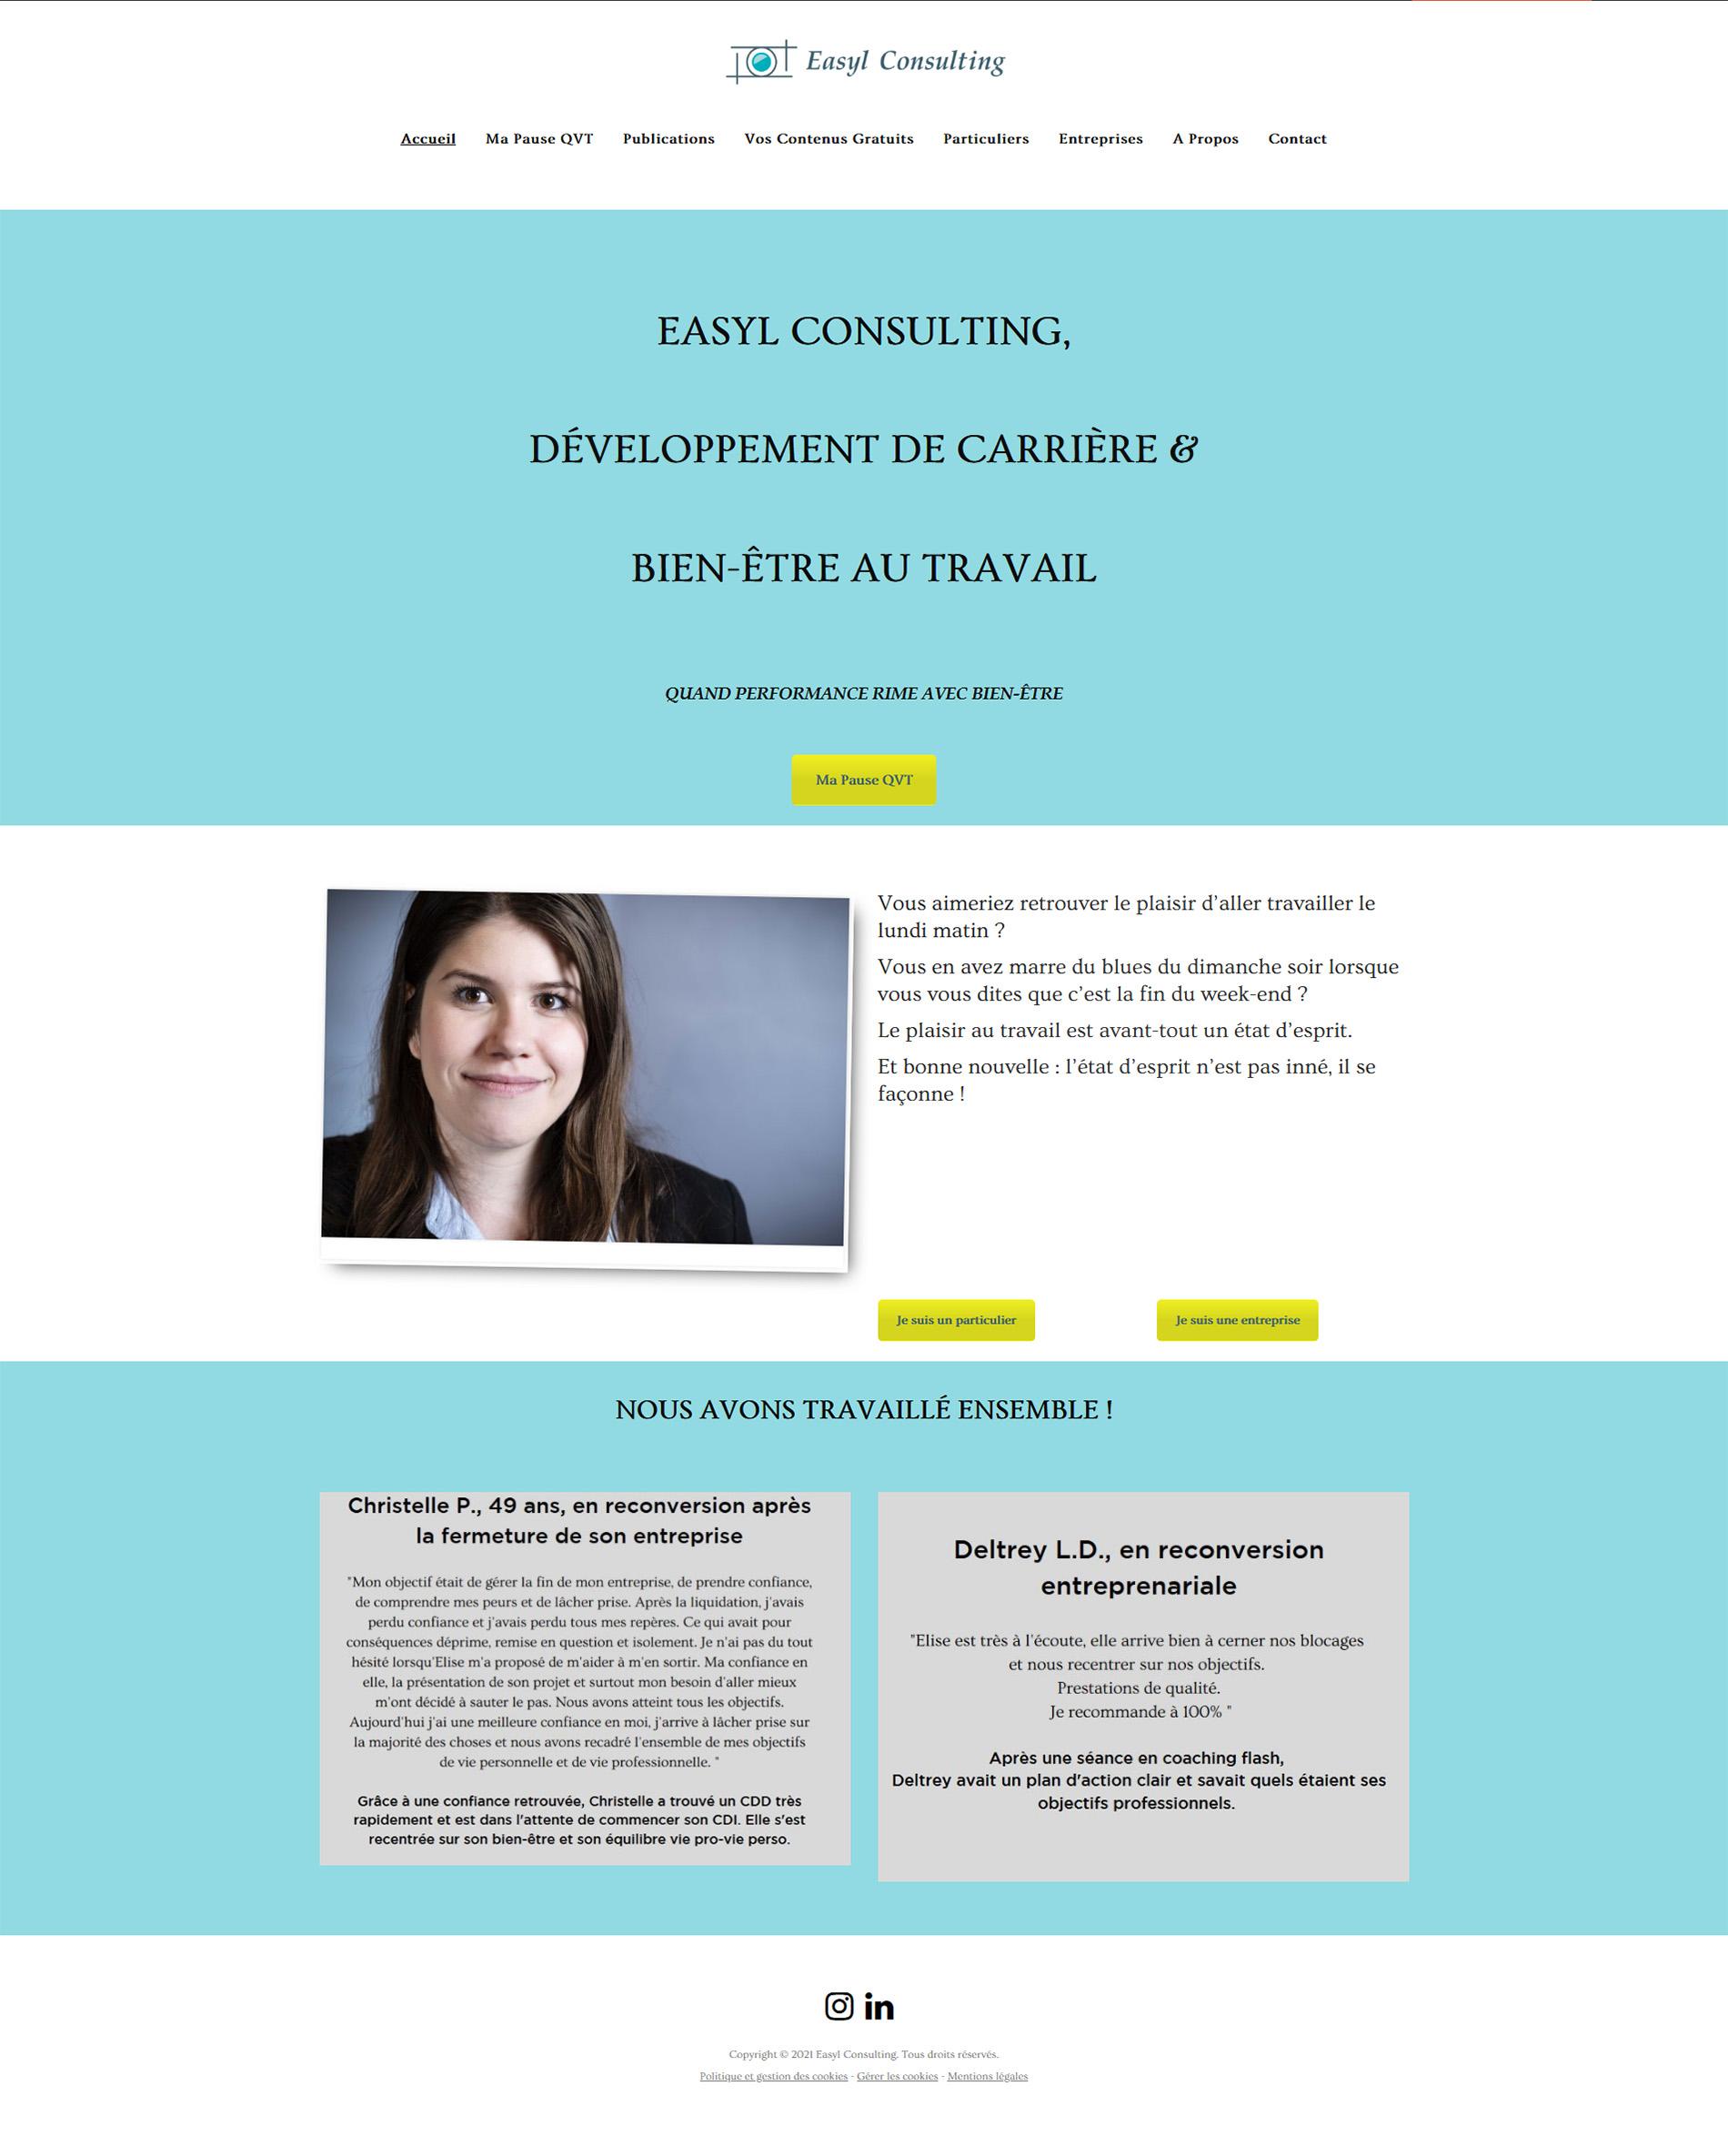 Screen avant refonte du site web d'Easyl Consulting